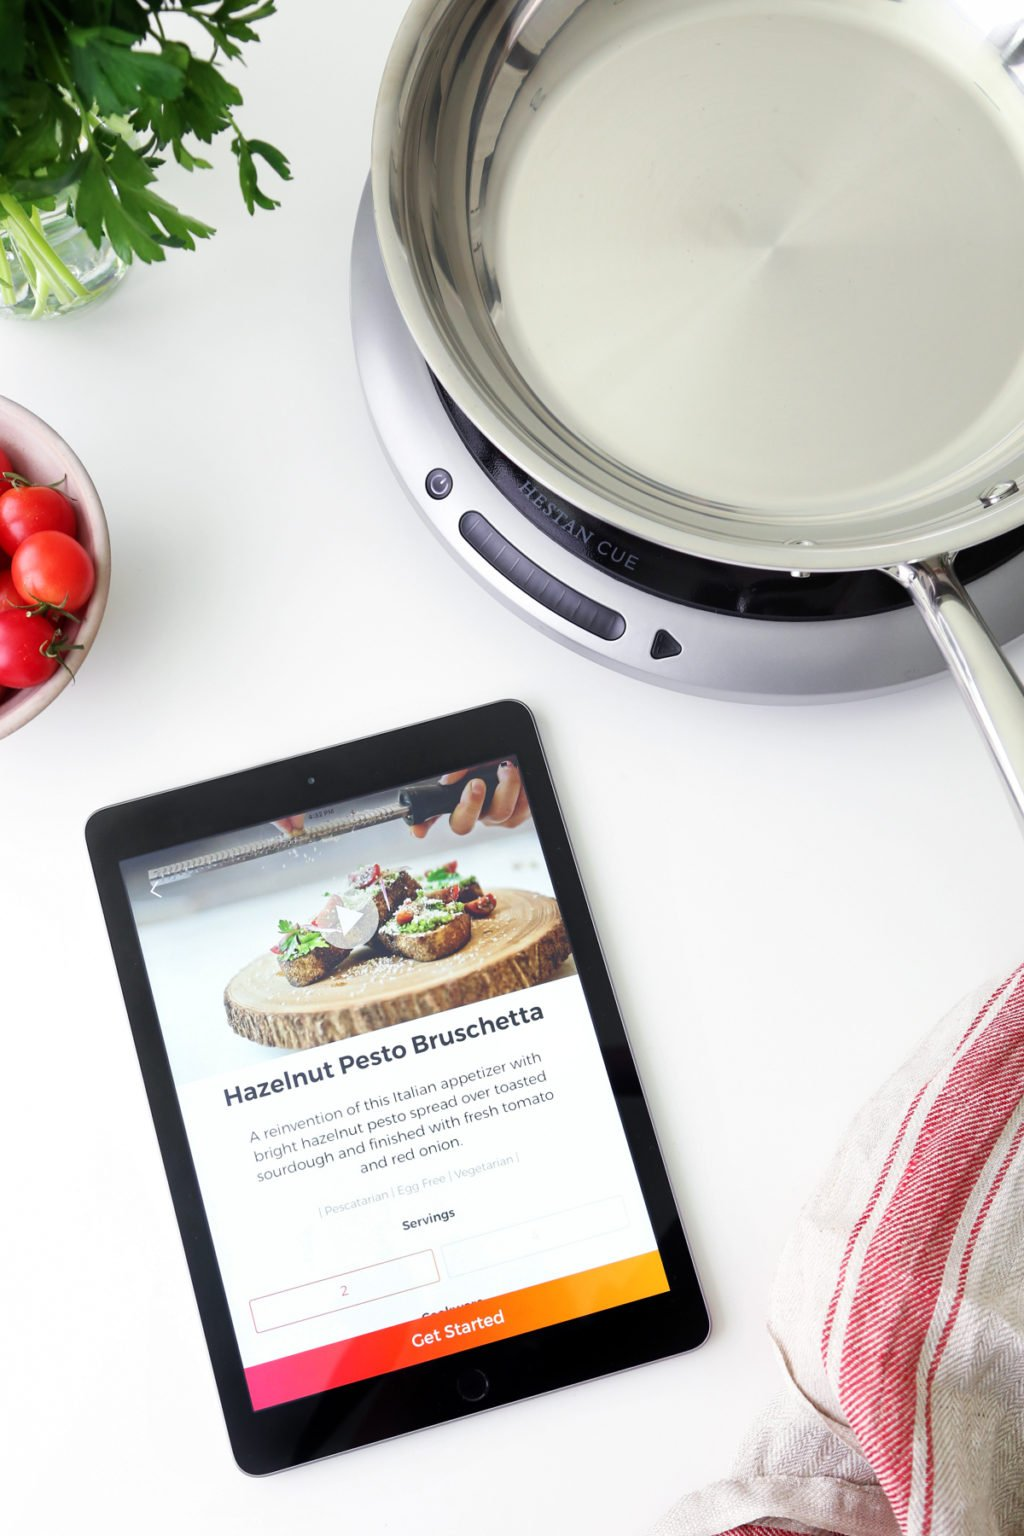 Hazelnut Pesto Bruschetta with the Hestan Cue | Wife Mama Foodie